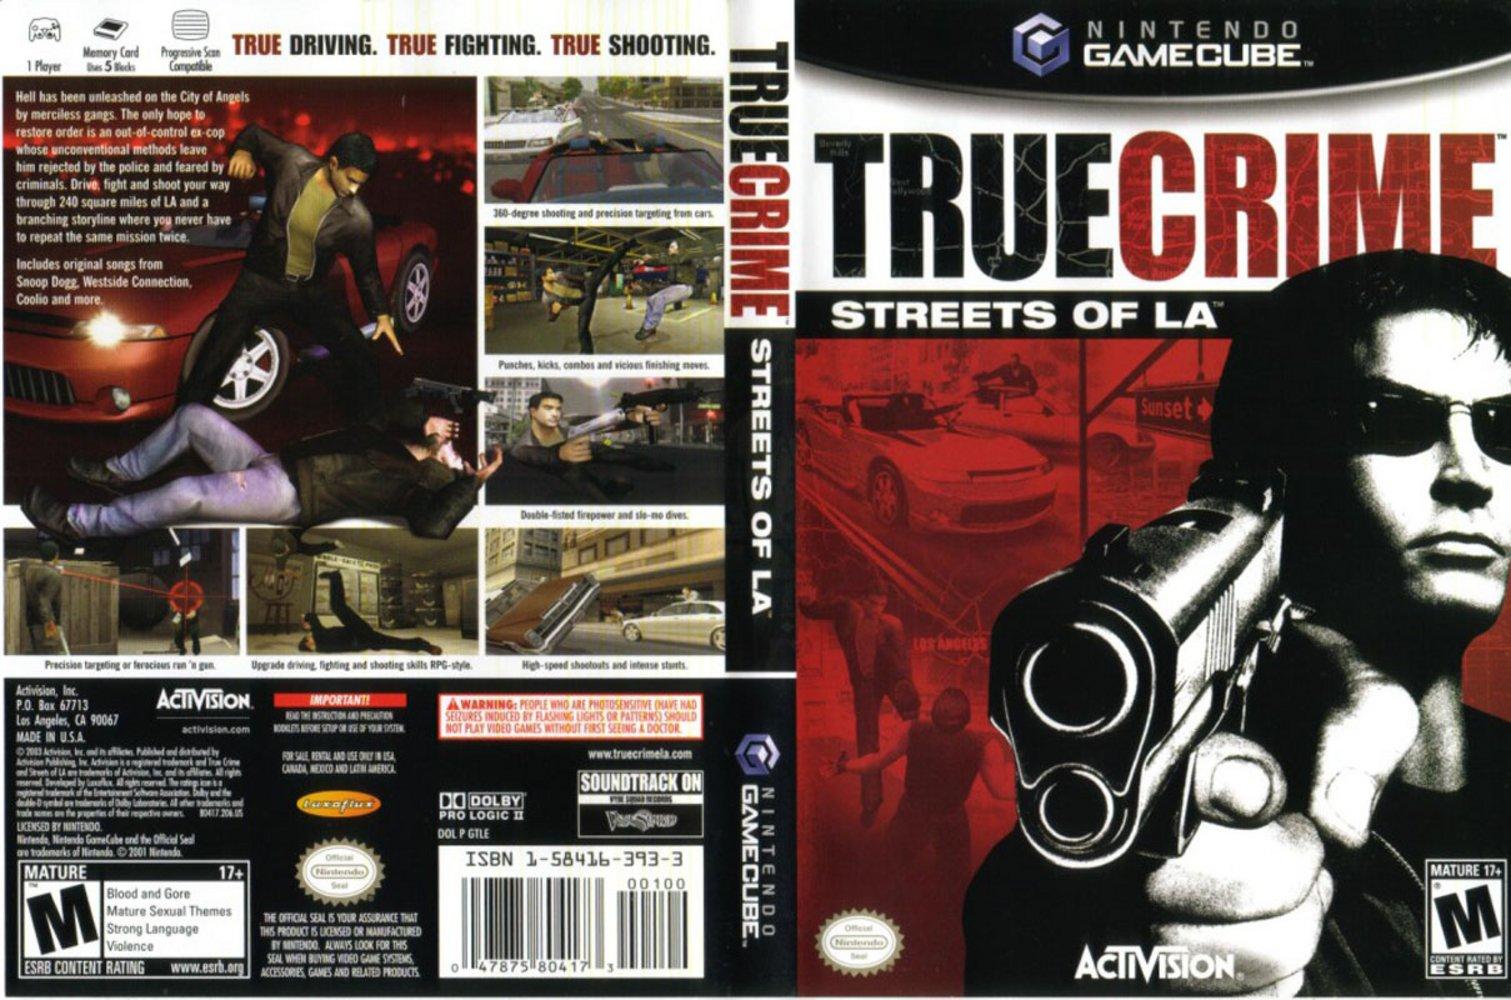 1511x1000 > True Crime: Streets Of LA Wallpapers